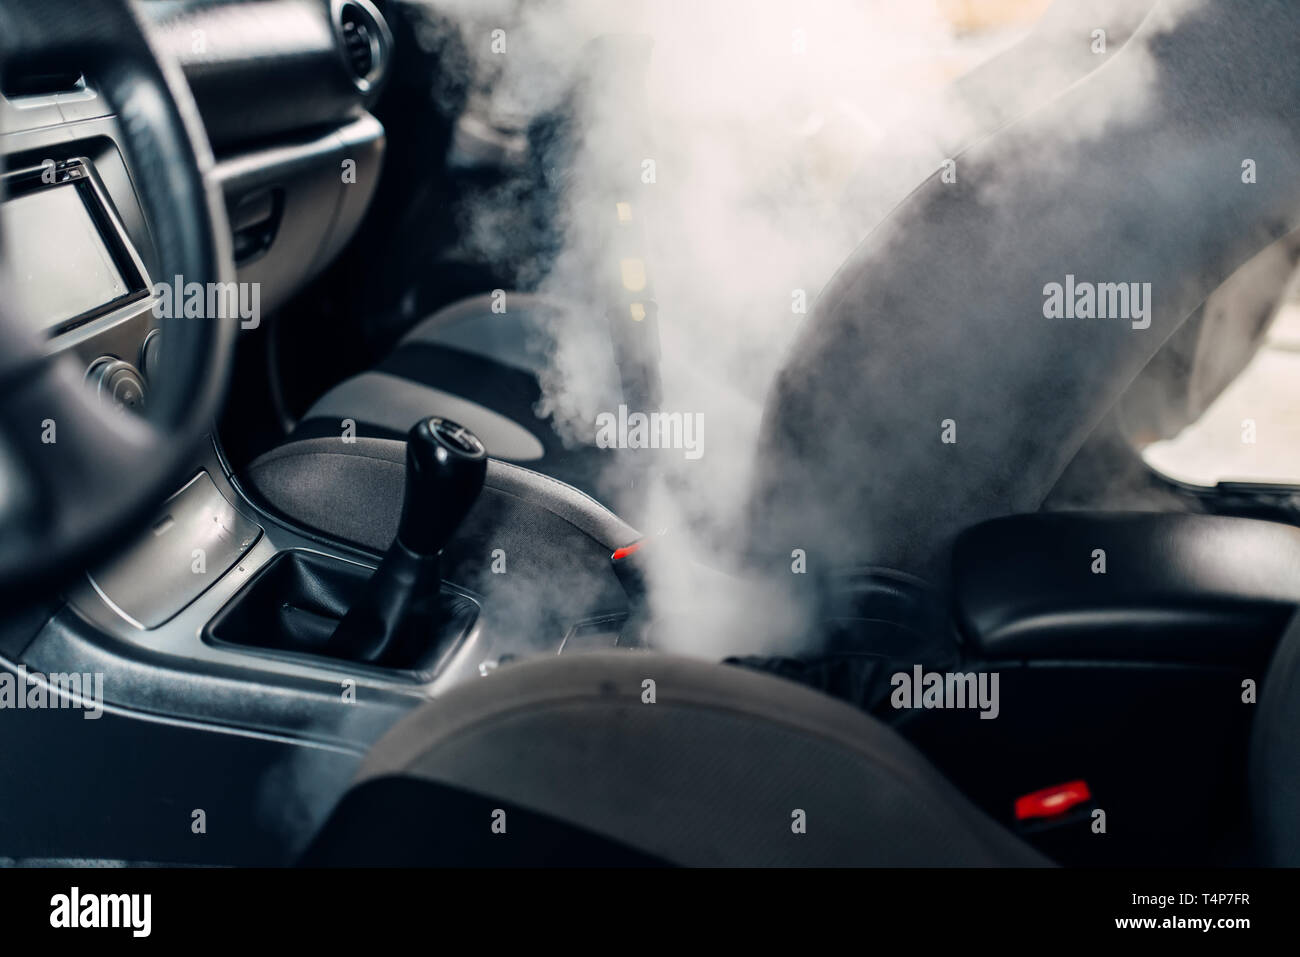 Steam Clean Car Interior >> Professional Dry Cleaning Of Car Interior With Steam Cleaner